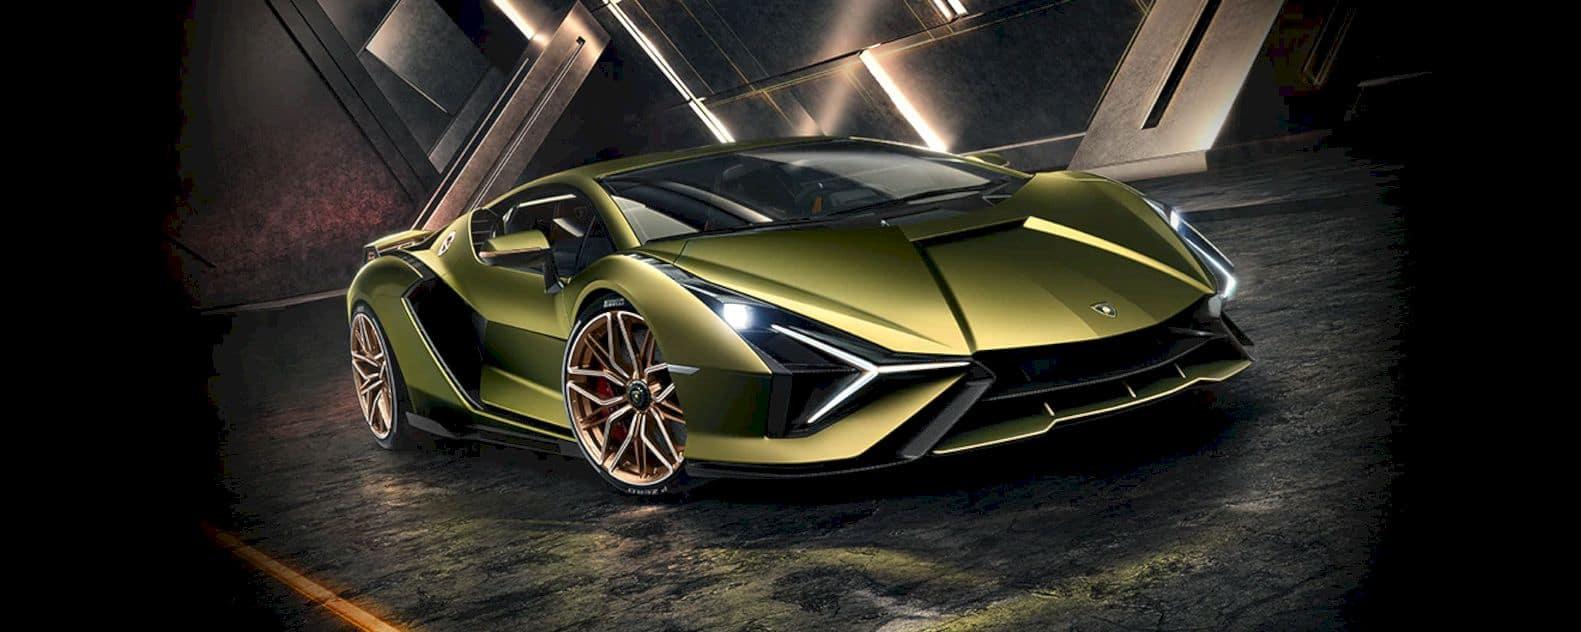 Lamborghini Sián FKP 37: Ahead of Its Time!